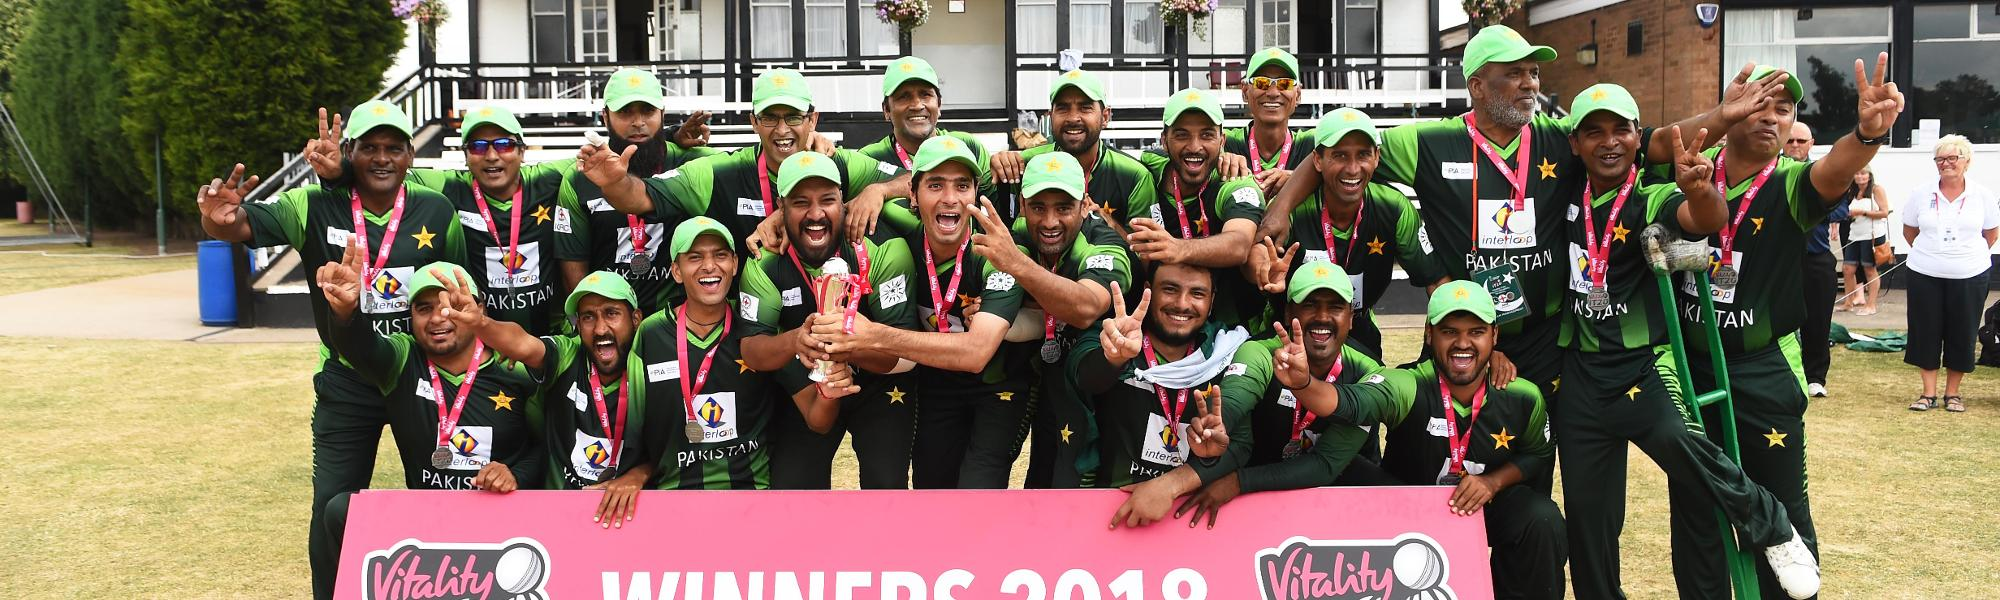 Pakistan PD team